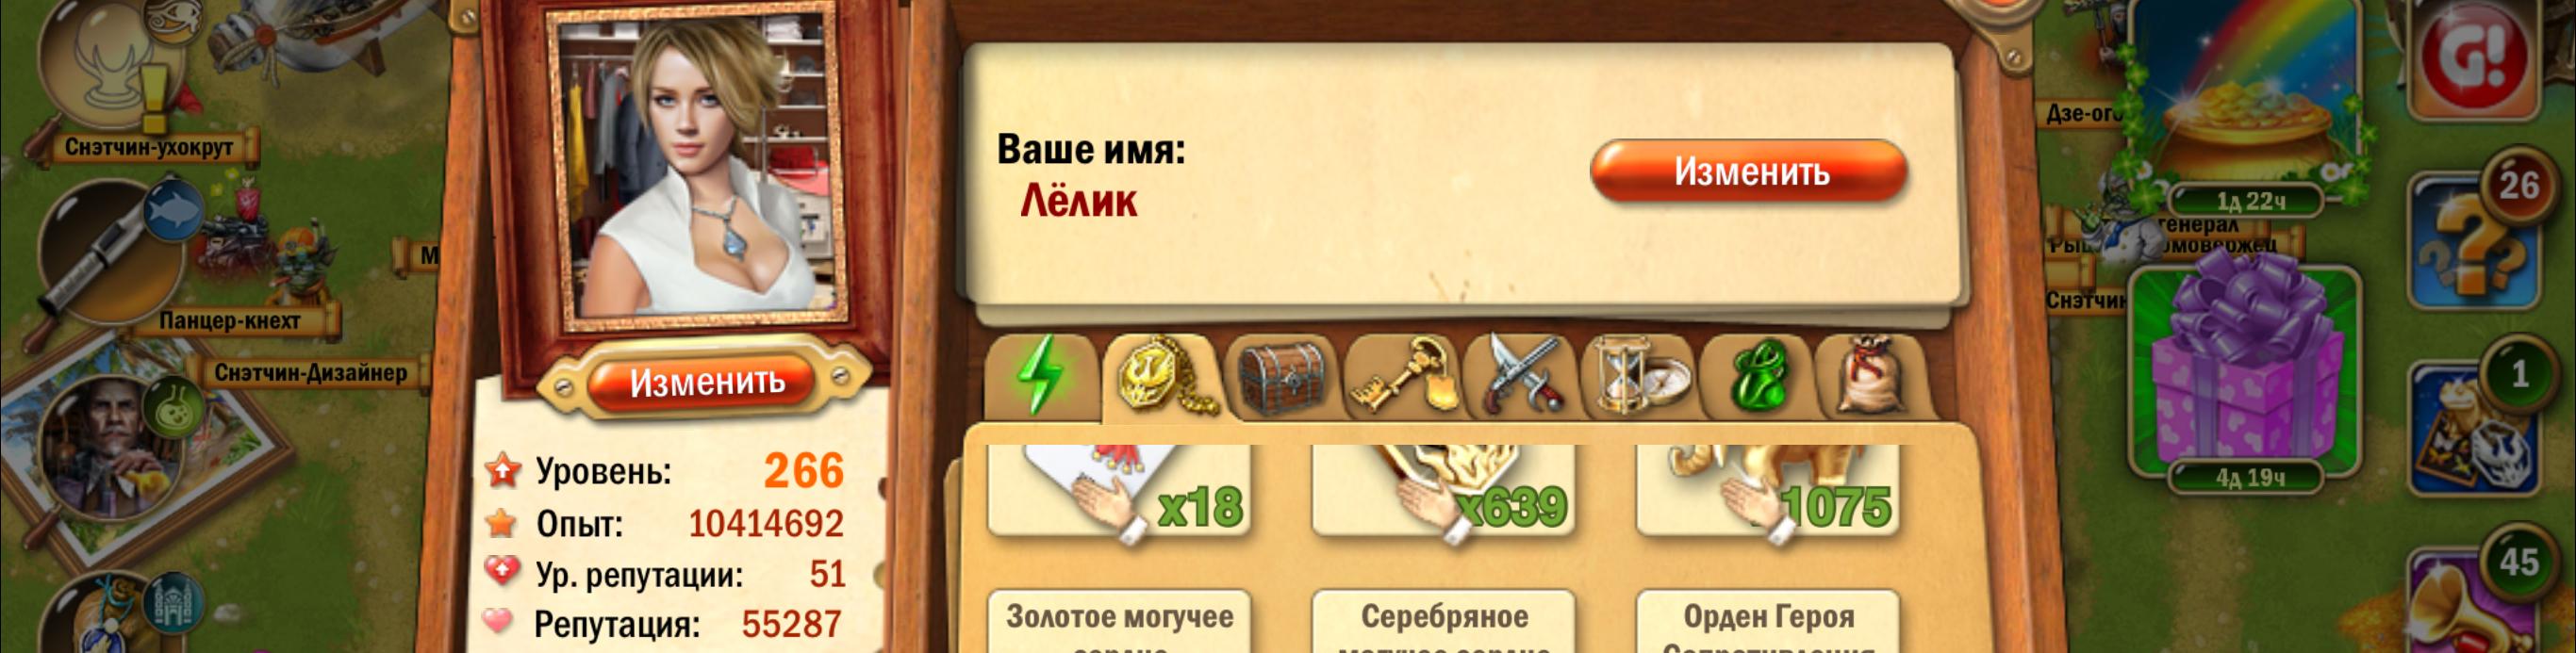 http://s8.uploads.ru/uaKIb.jpg